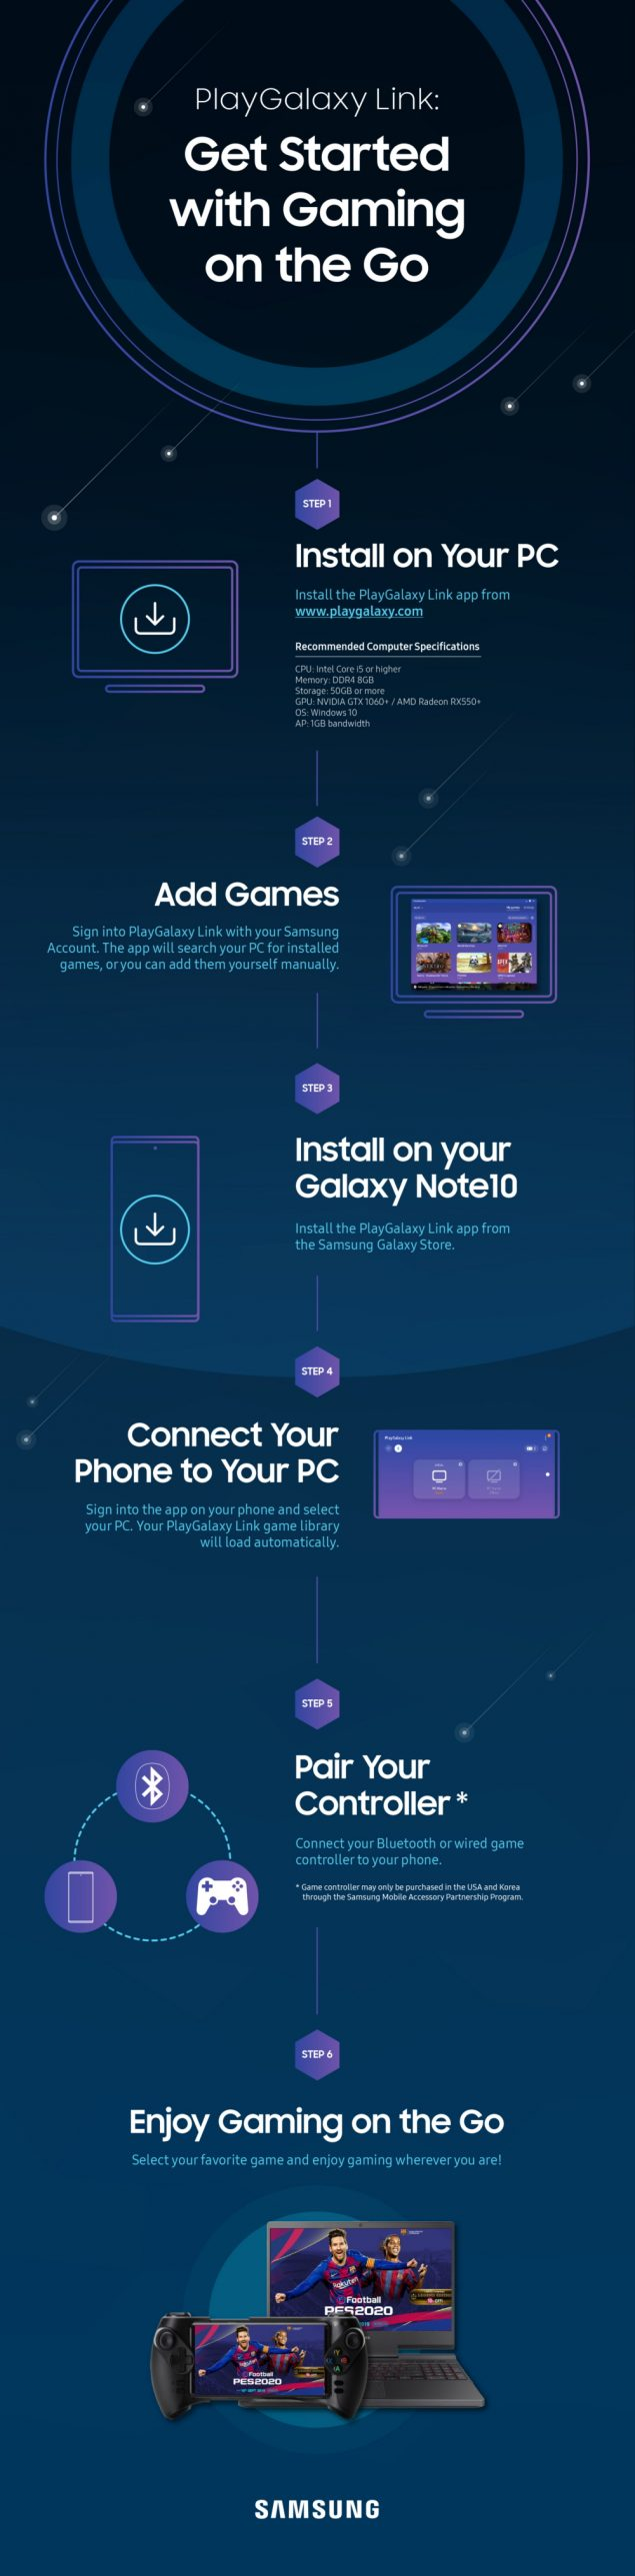 samsung playgalaxy link galaxy s9 note 9 a90 fold beta